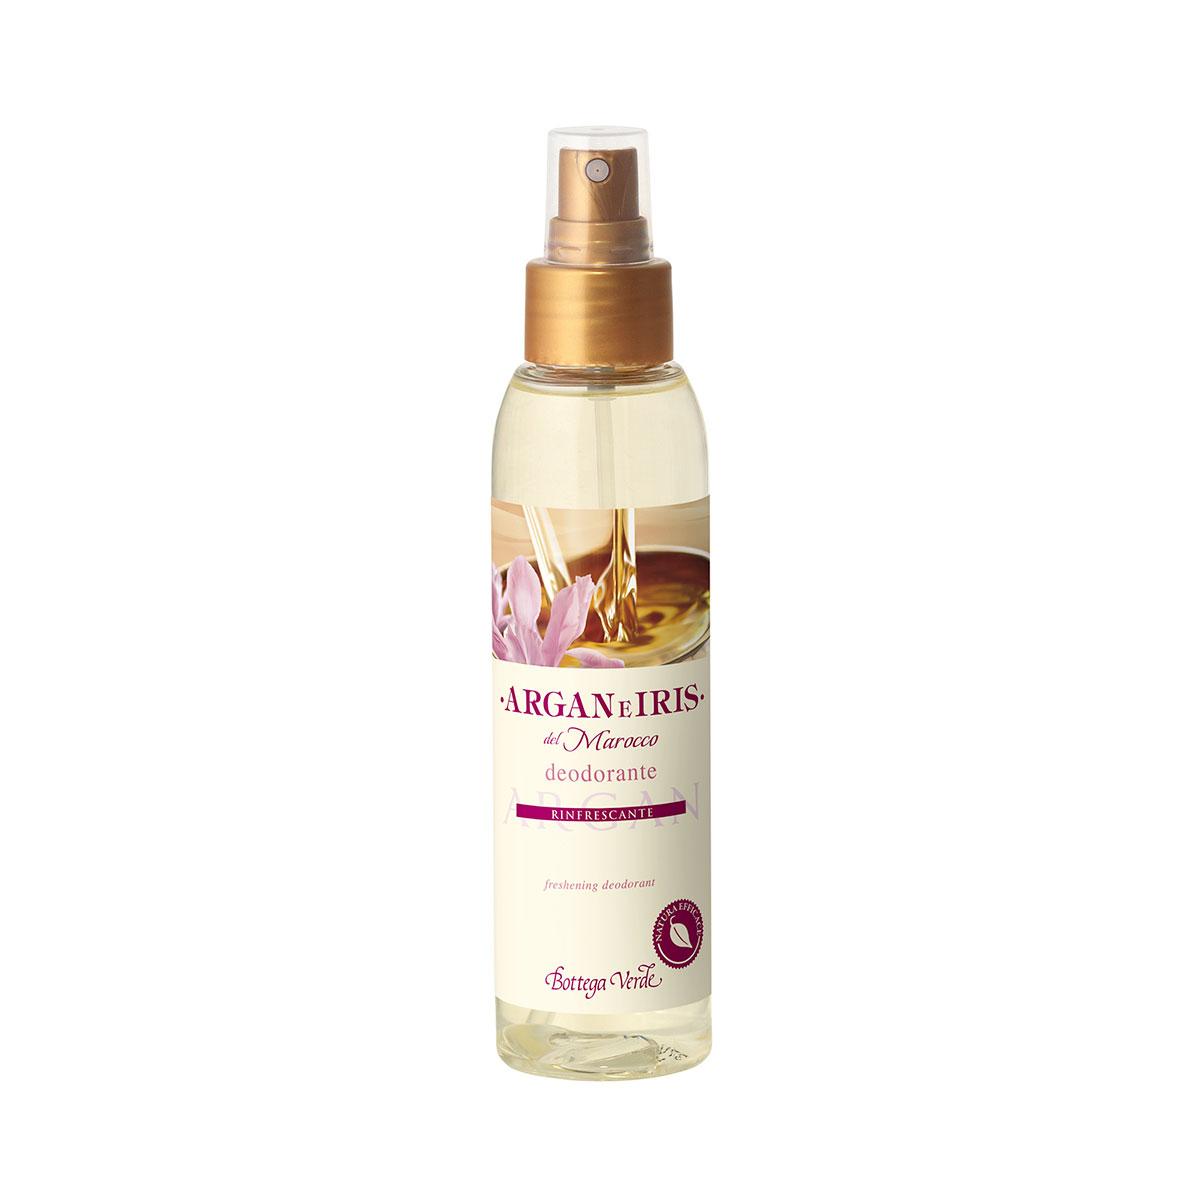 Argan e Iris del Marocco - Parfum deodorant rinfrescante (125 ml)